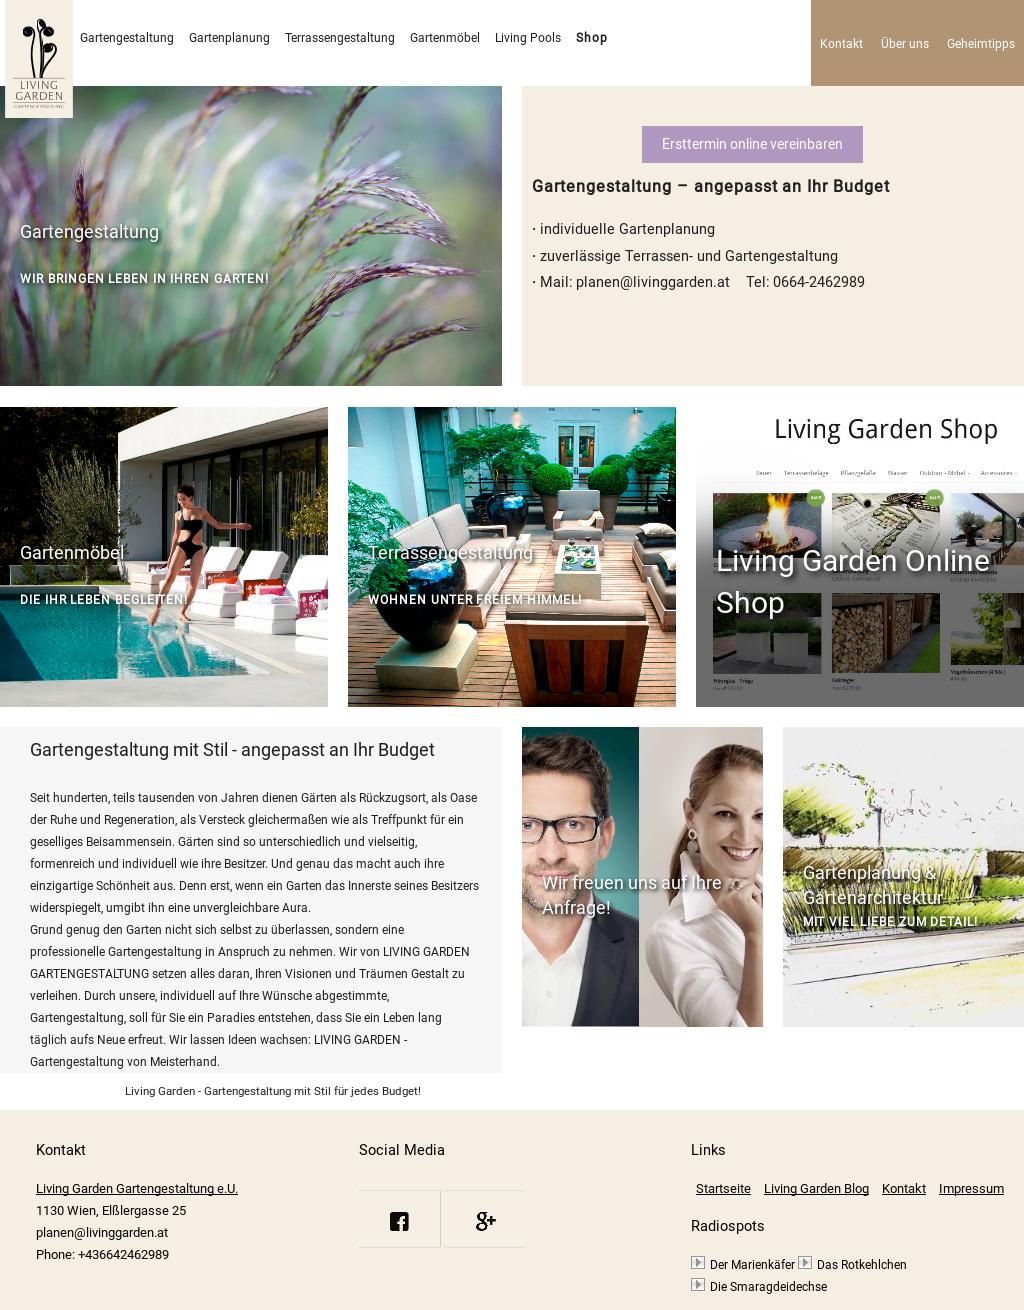 Gartengestaltung Beispiele - Garten Geschtaltung - Zheqa.com